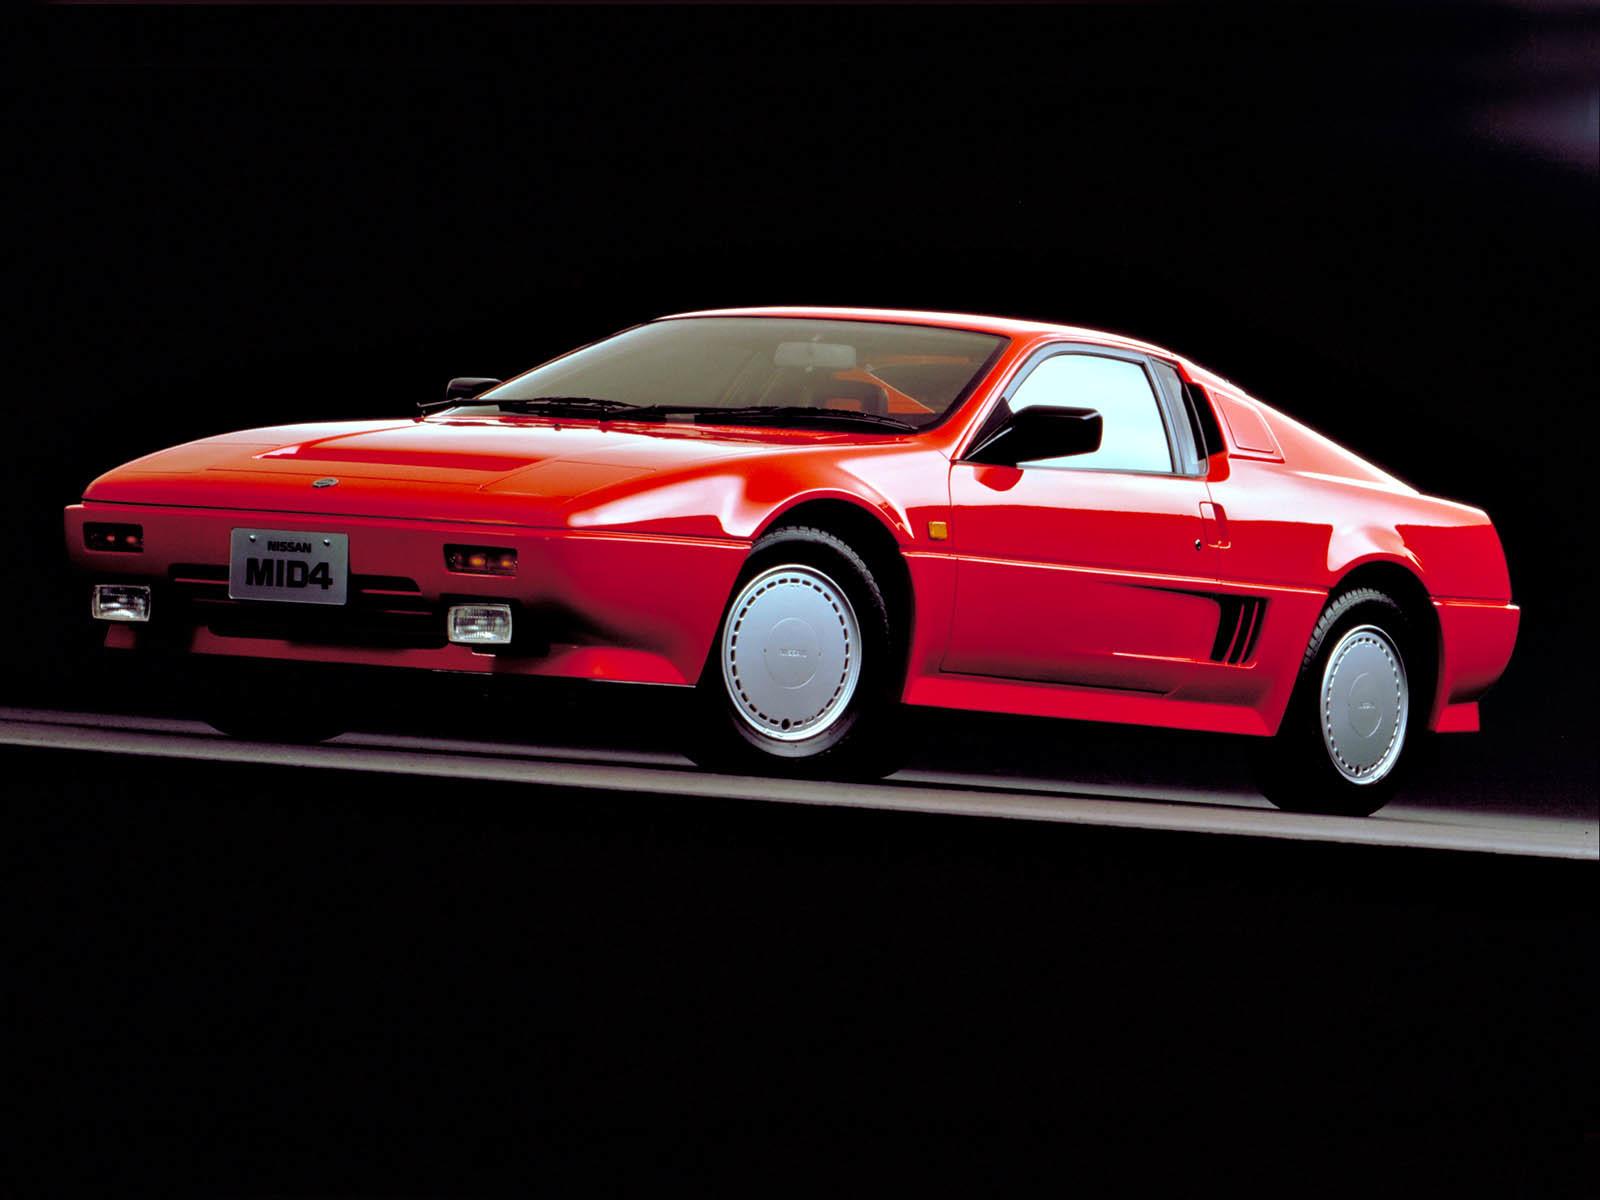 Foto de Nissan MID-4 Concept 1985 (2/12)